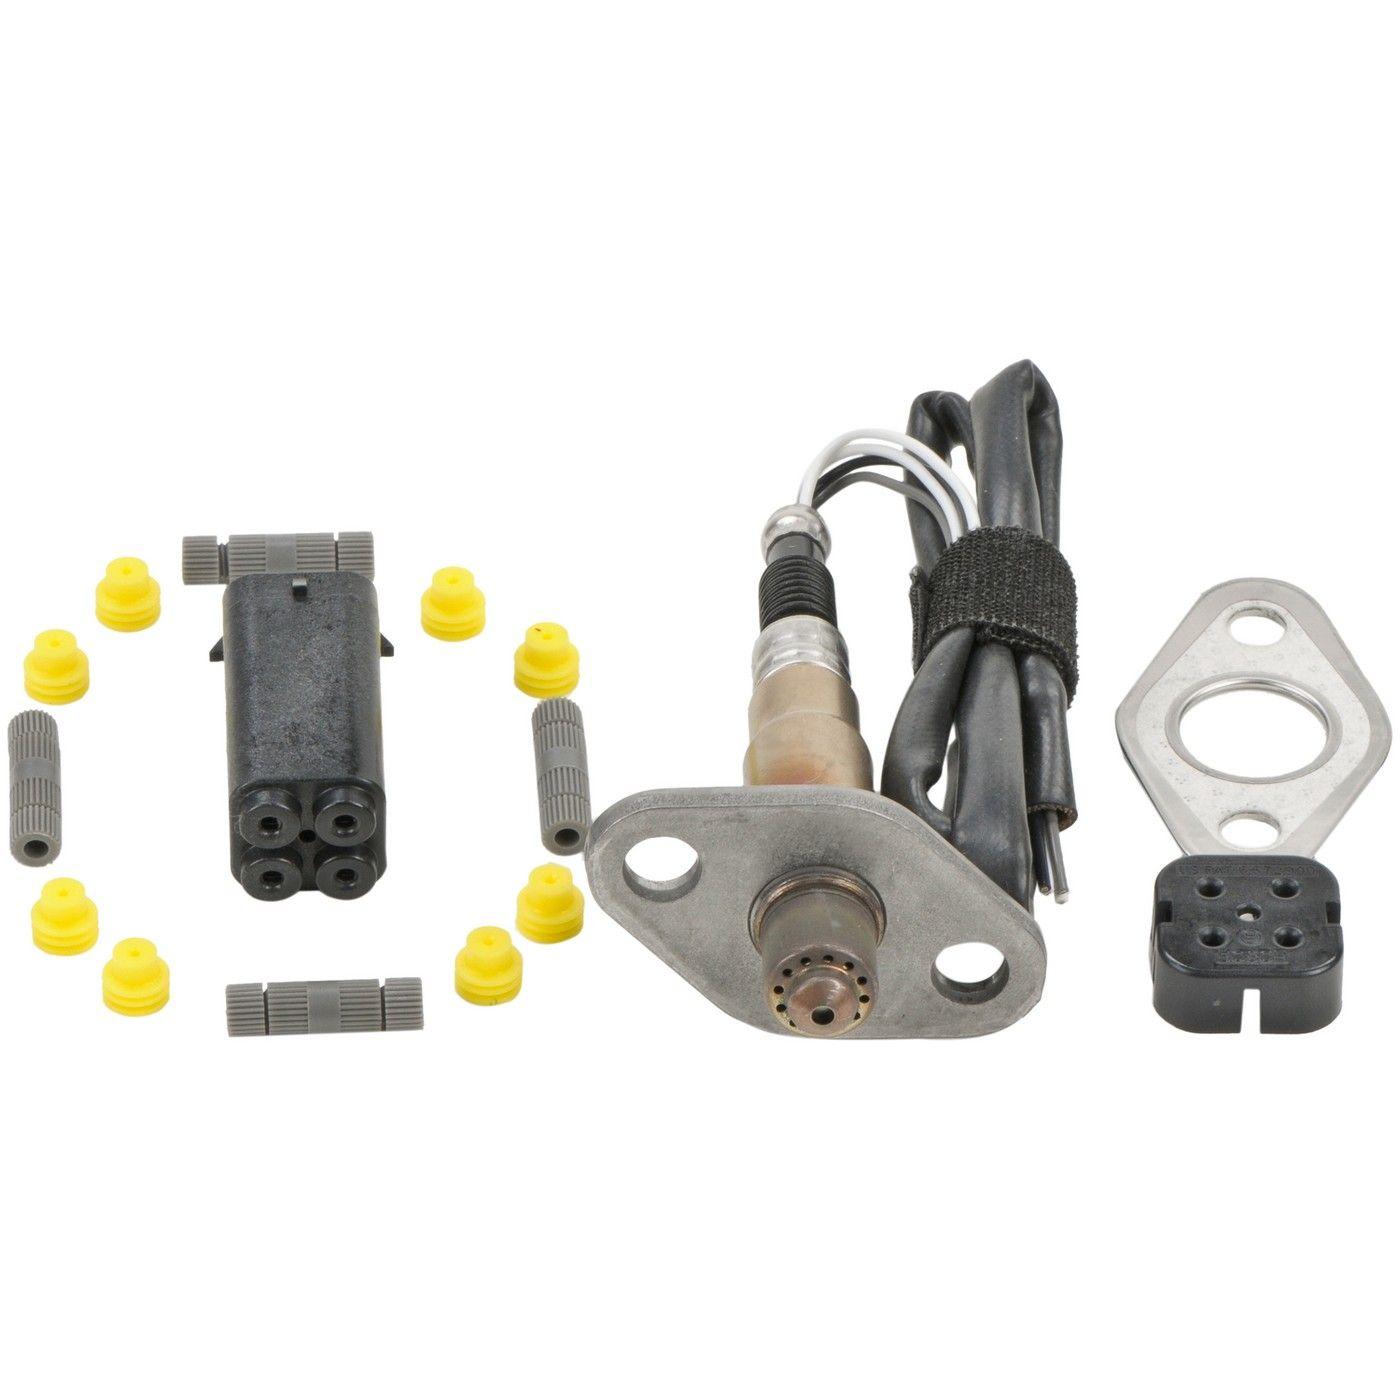 2001 Toyota Echo Oxygen Sensor Wiring